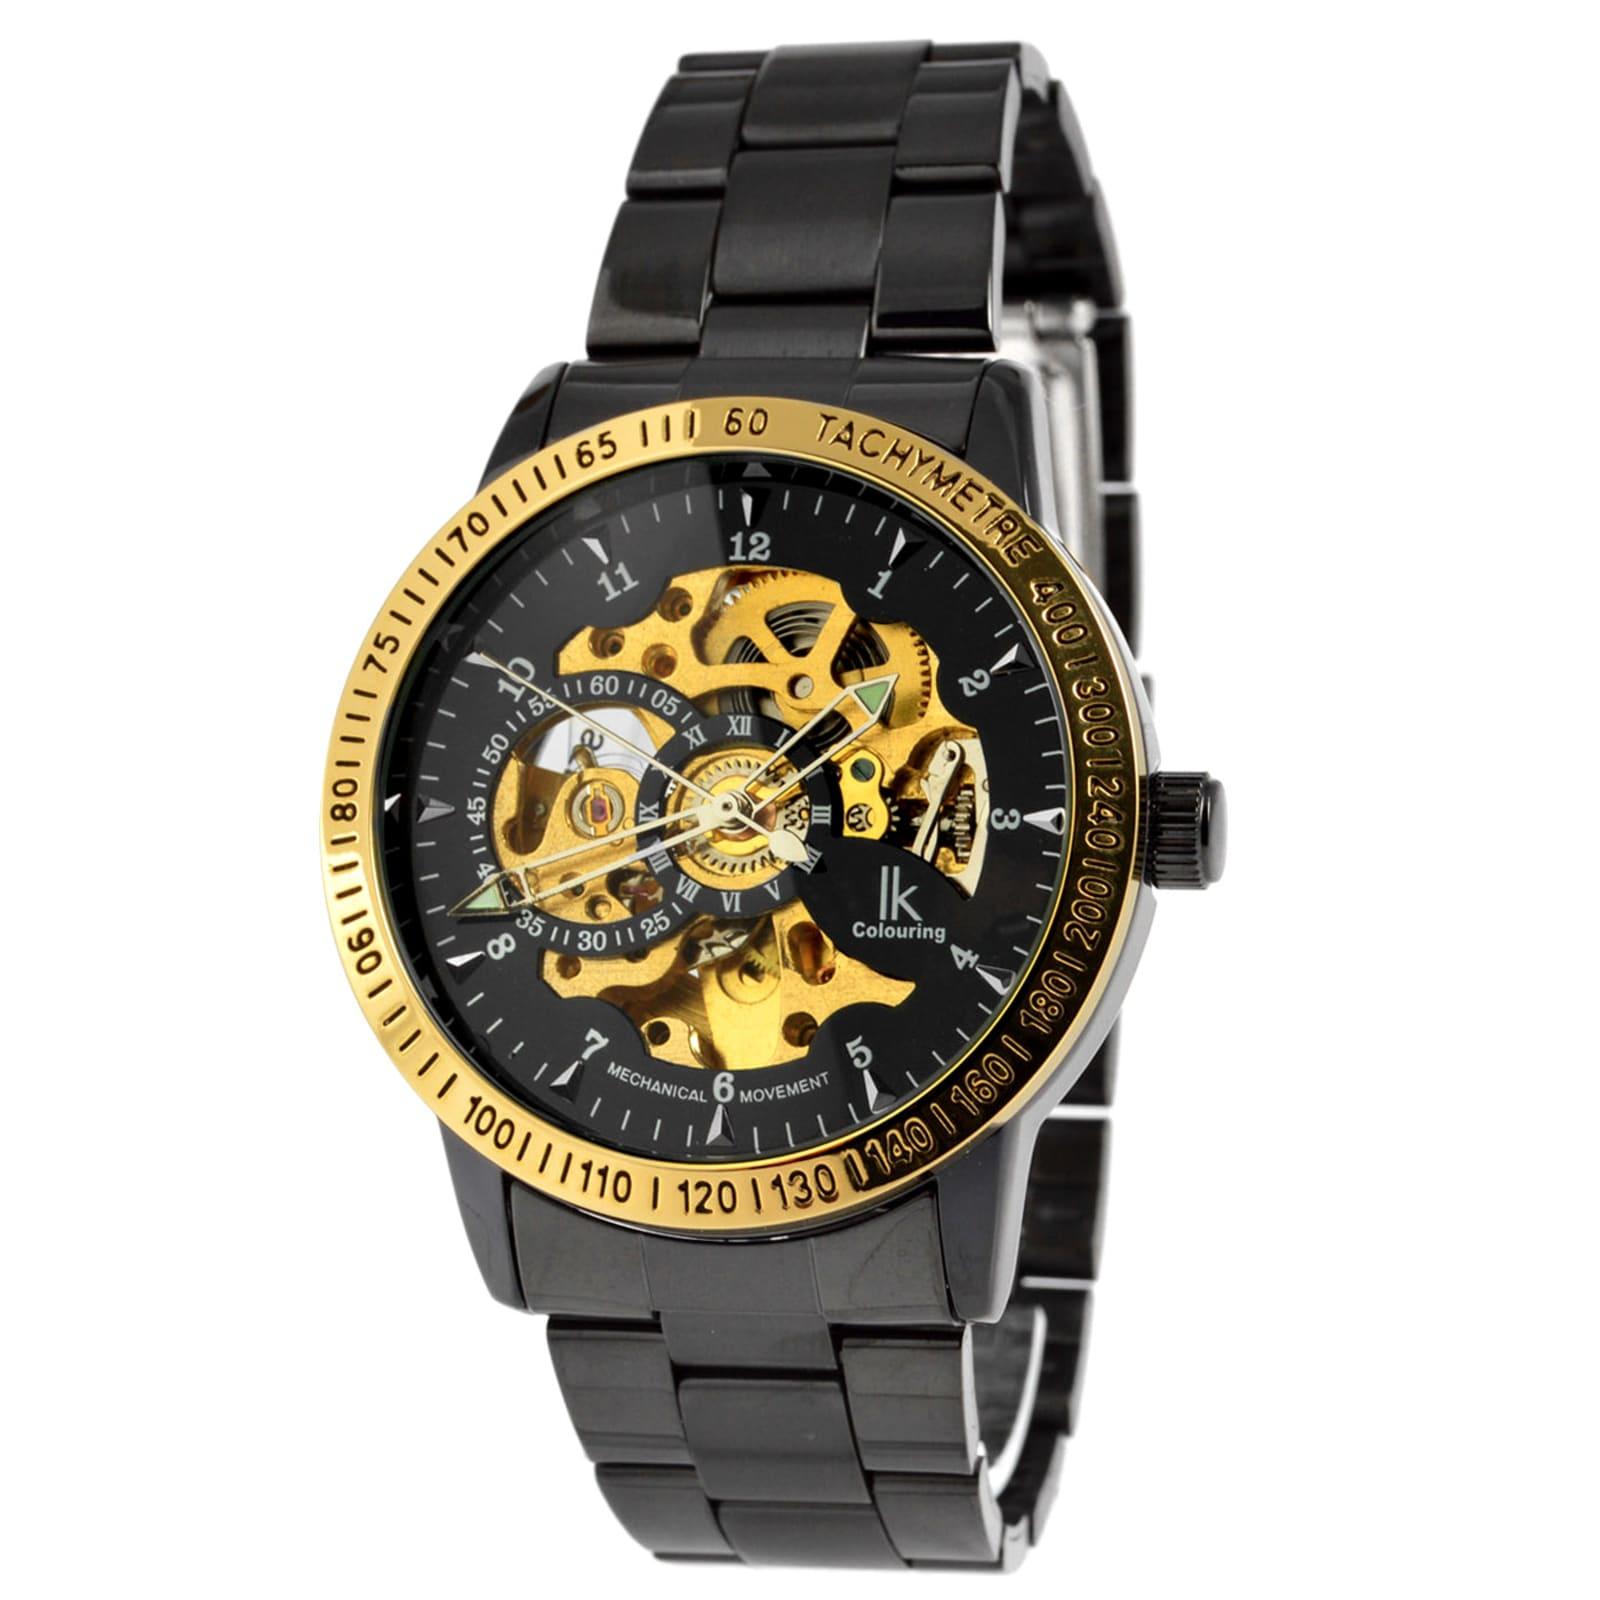 cdfdff429 IK Colouring Čierne hodinky Rolat s lunetou v zlatej farbe - Glami.sk